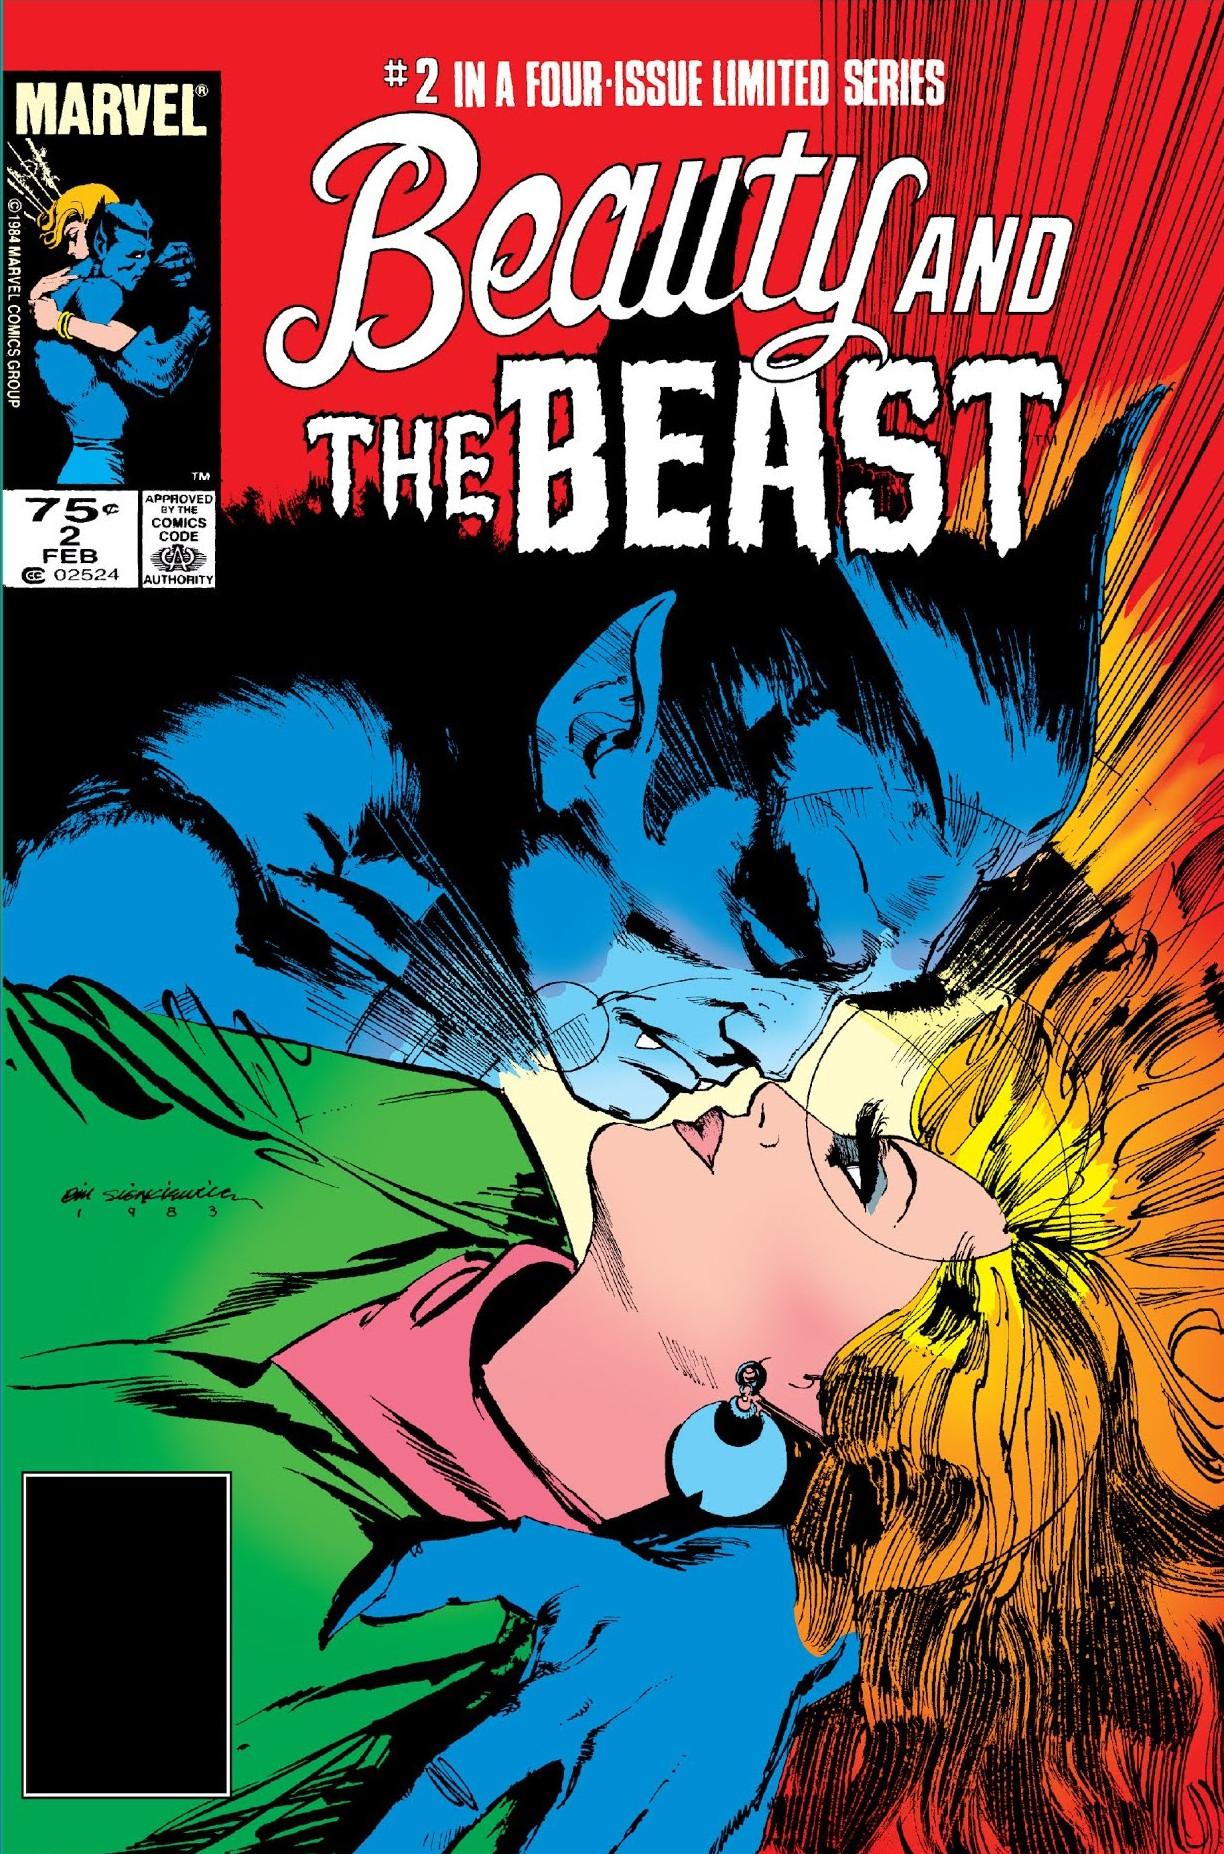 Beauty and the Beast Vol 1 2.jpg